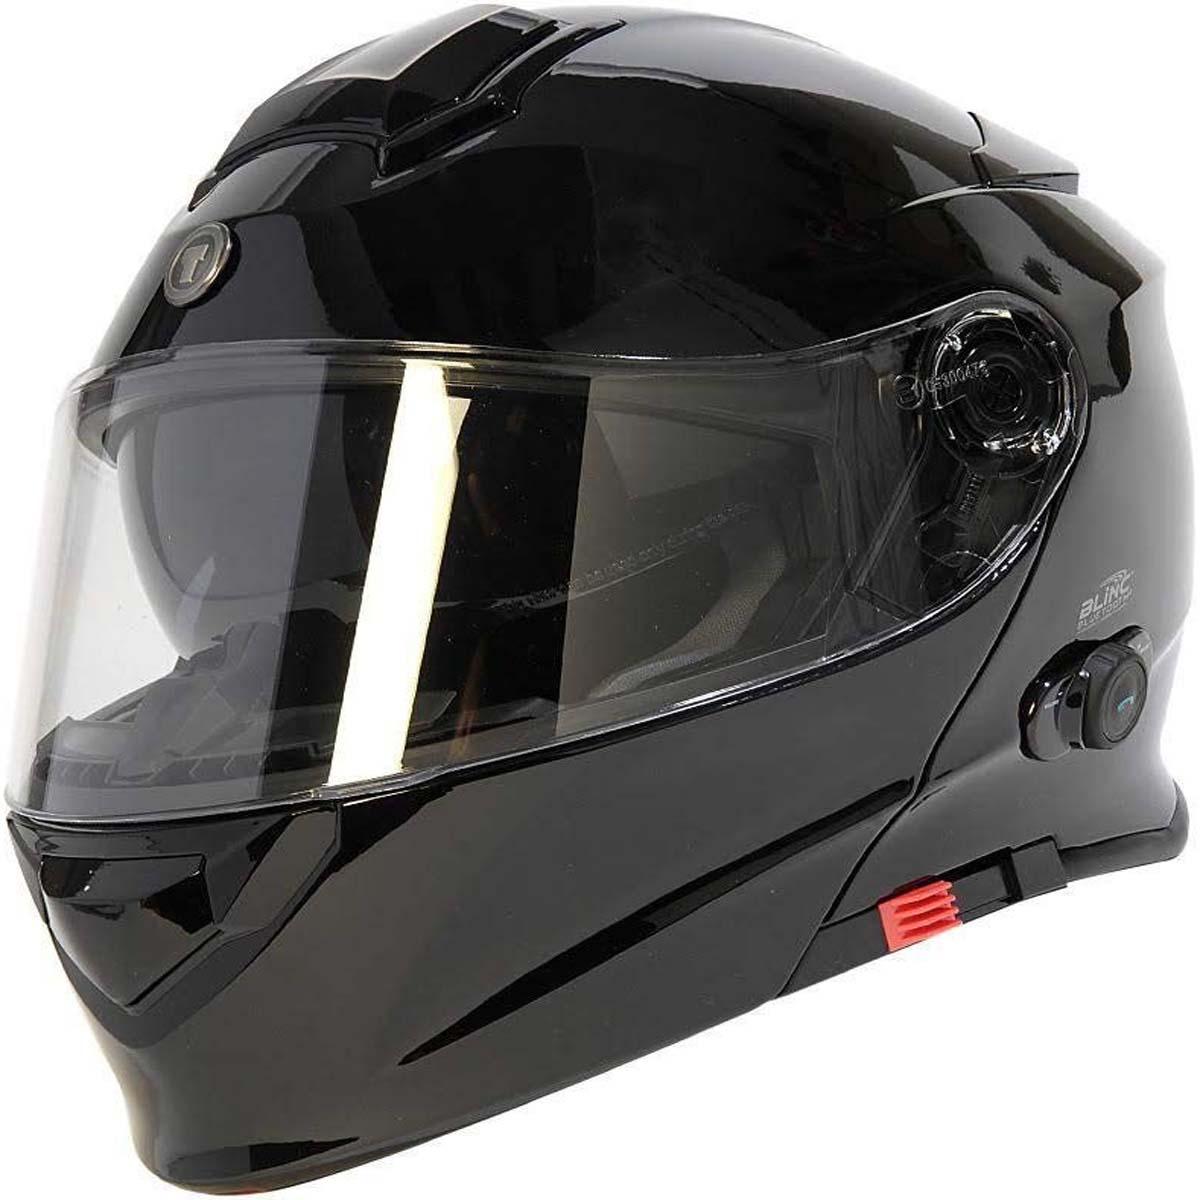 f2c09fc8 Torc T-28B Helmet Solids Gloss Black. Previous